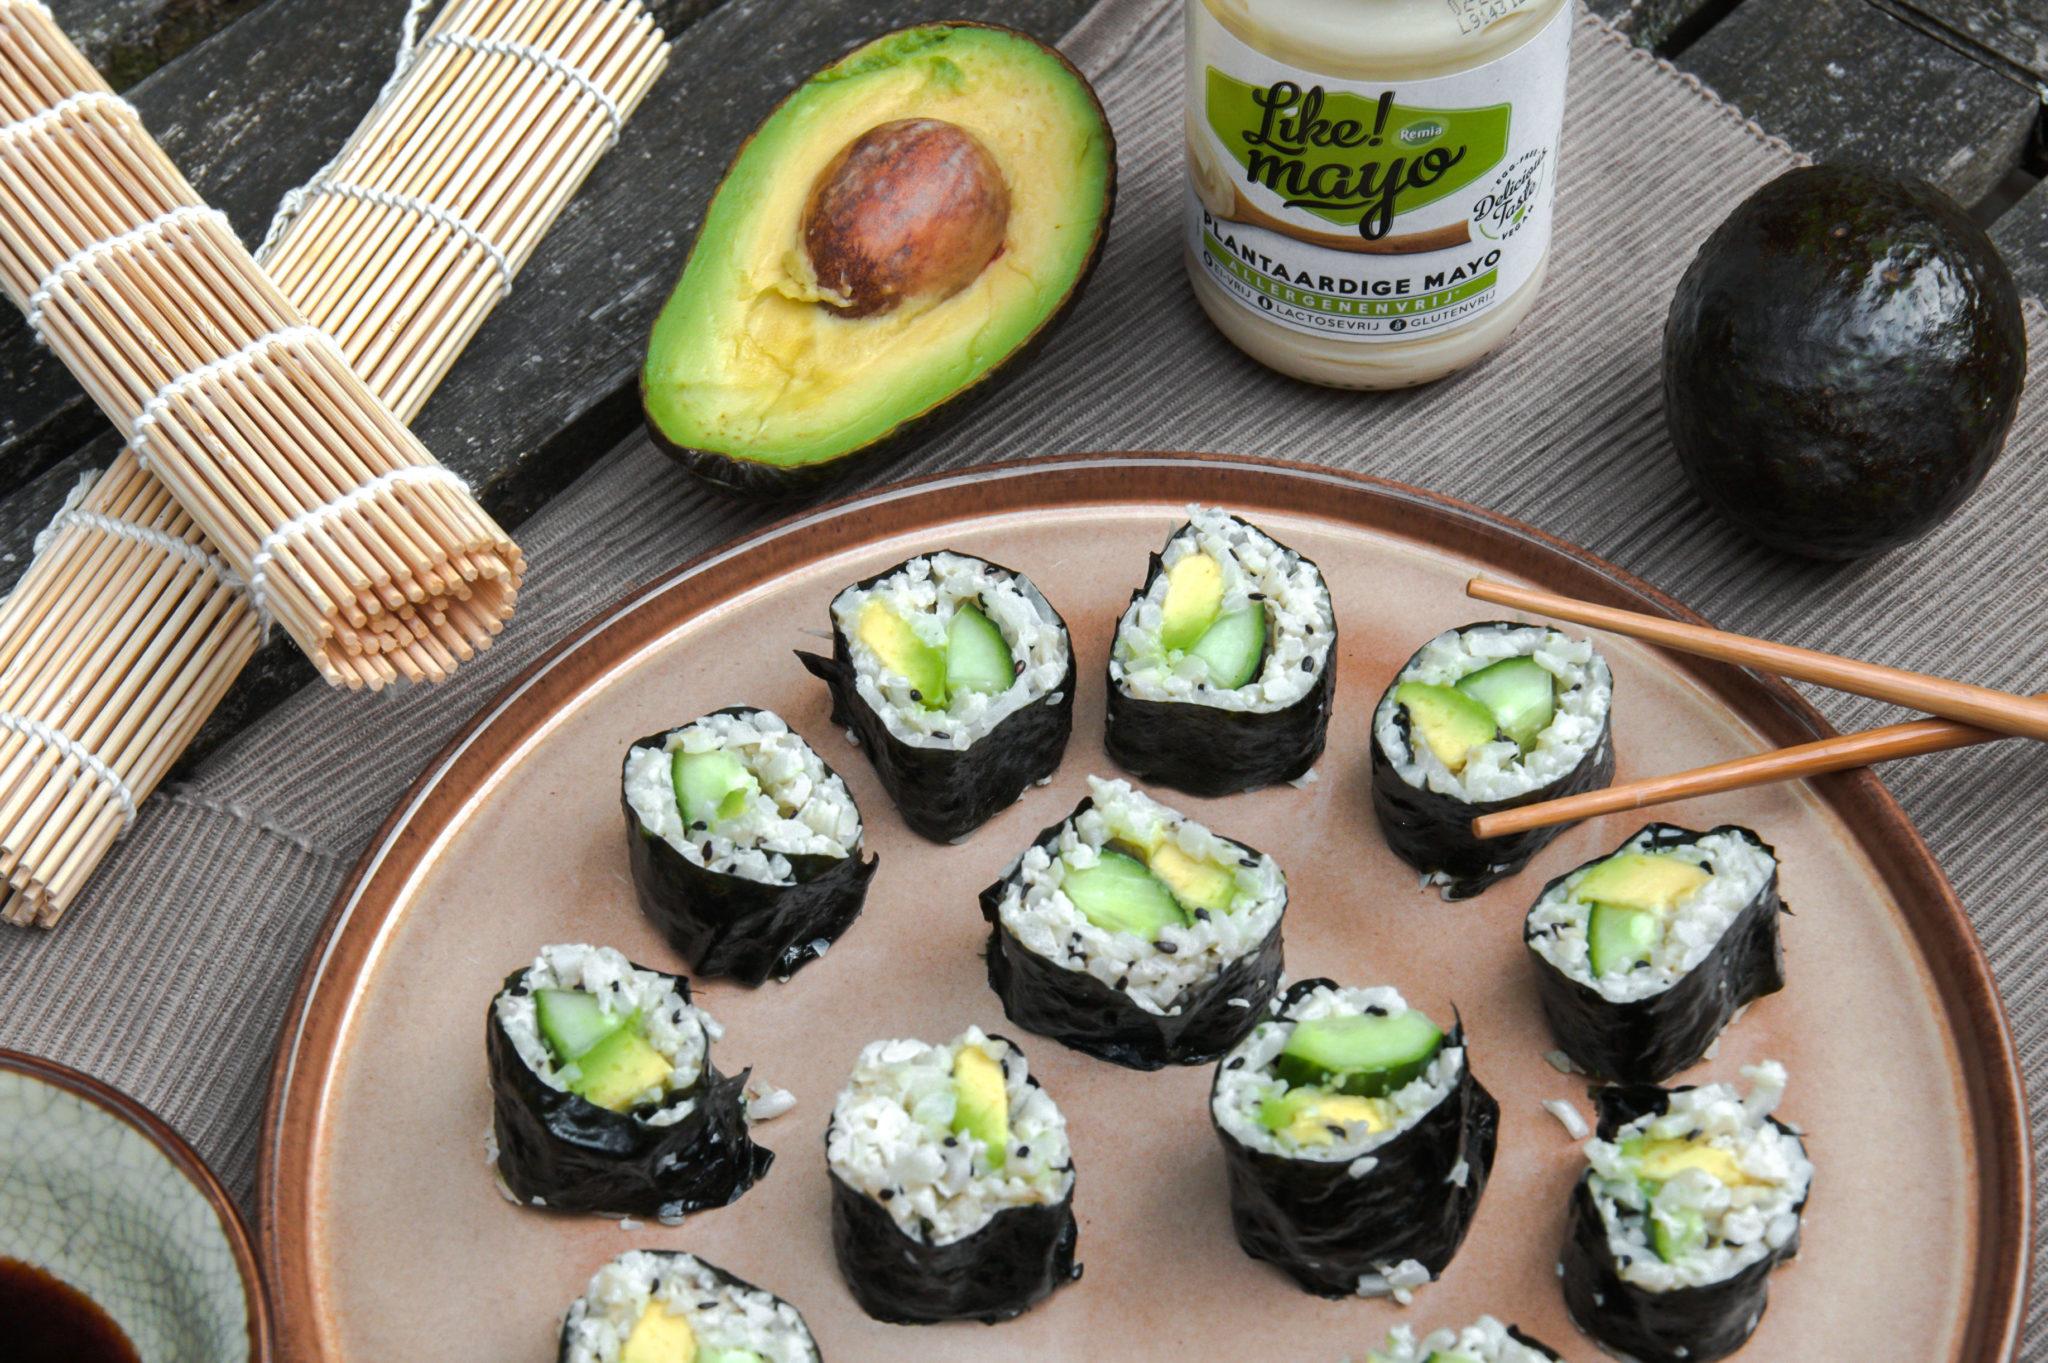 Vegan sushi met bloemkoolrijst, avocado en komkommer